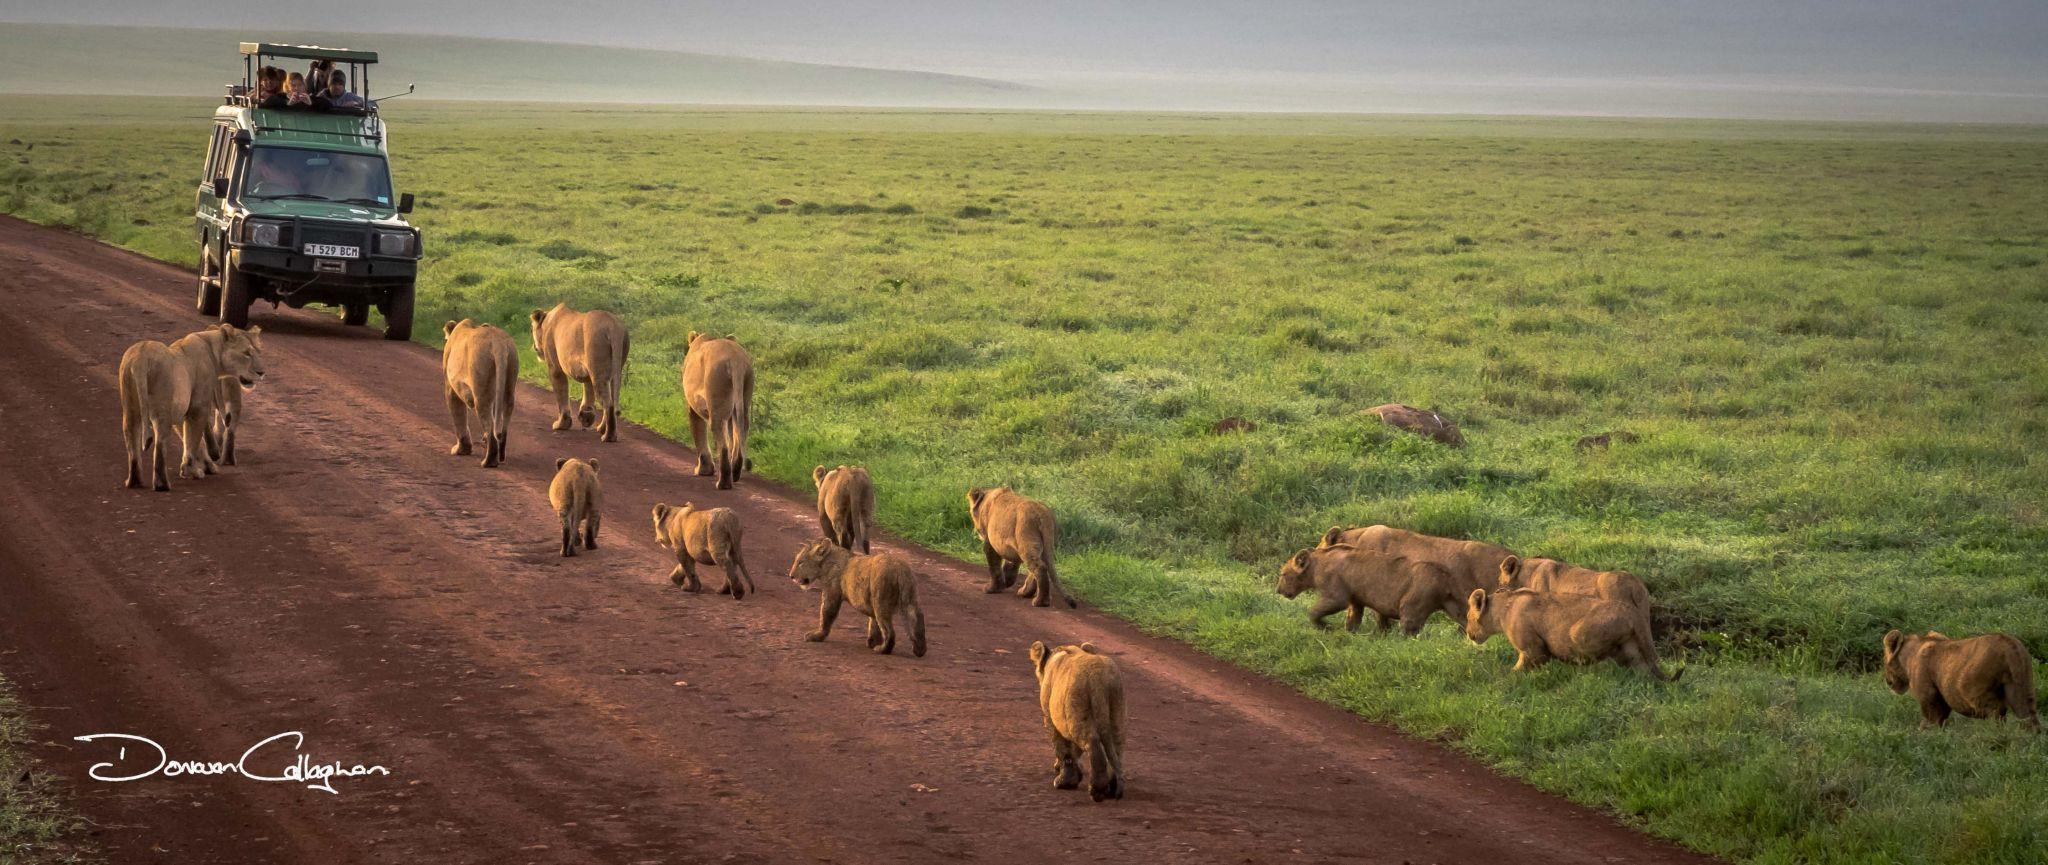 Ngorongoro Crater Lion pride, Tanzania